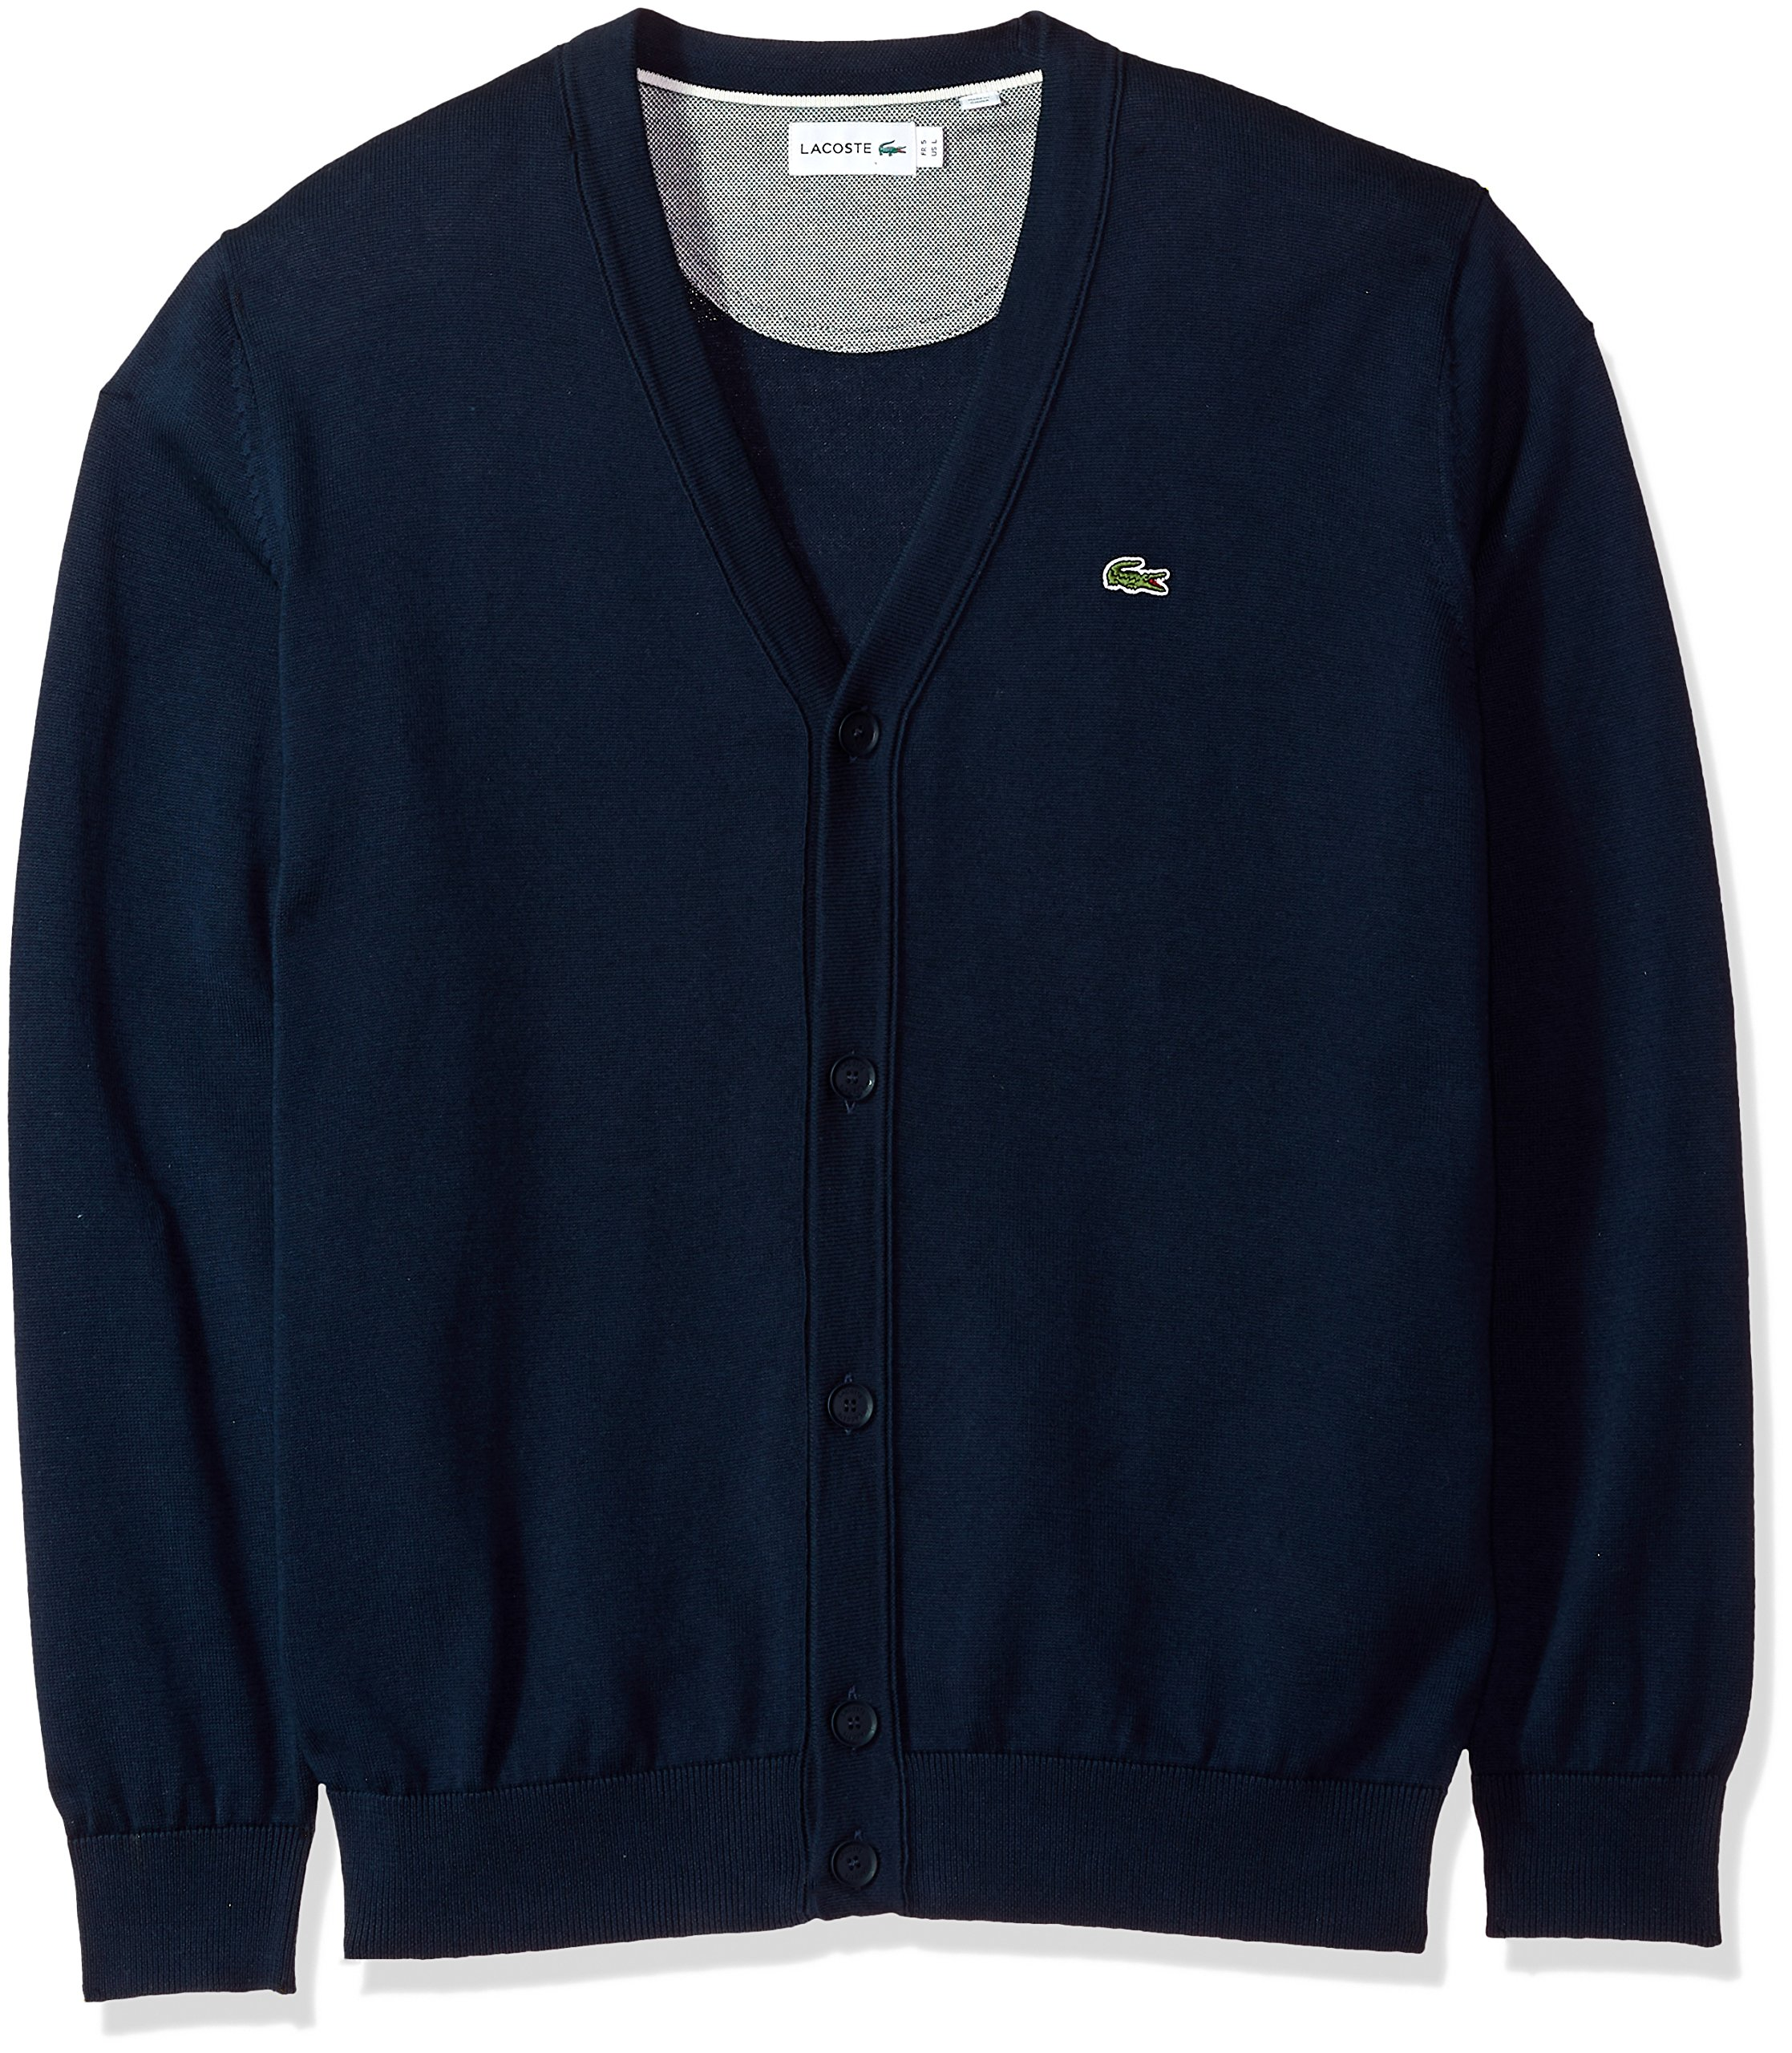 Lacoste Men's Long Sleeve Jersey Cardigan Sweater, Ah4564, Navy Blue/Cake/Flour White, 6